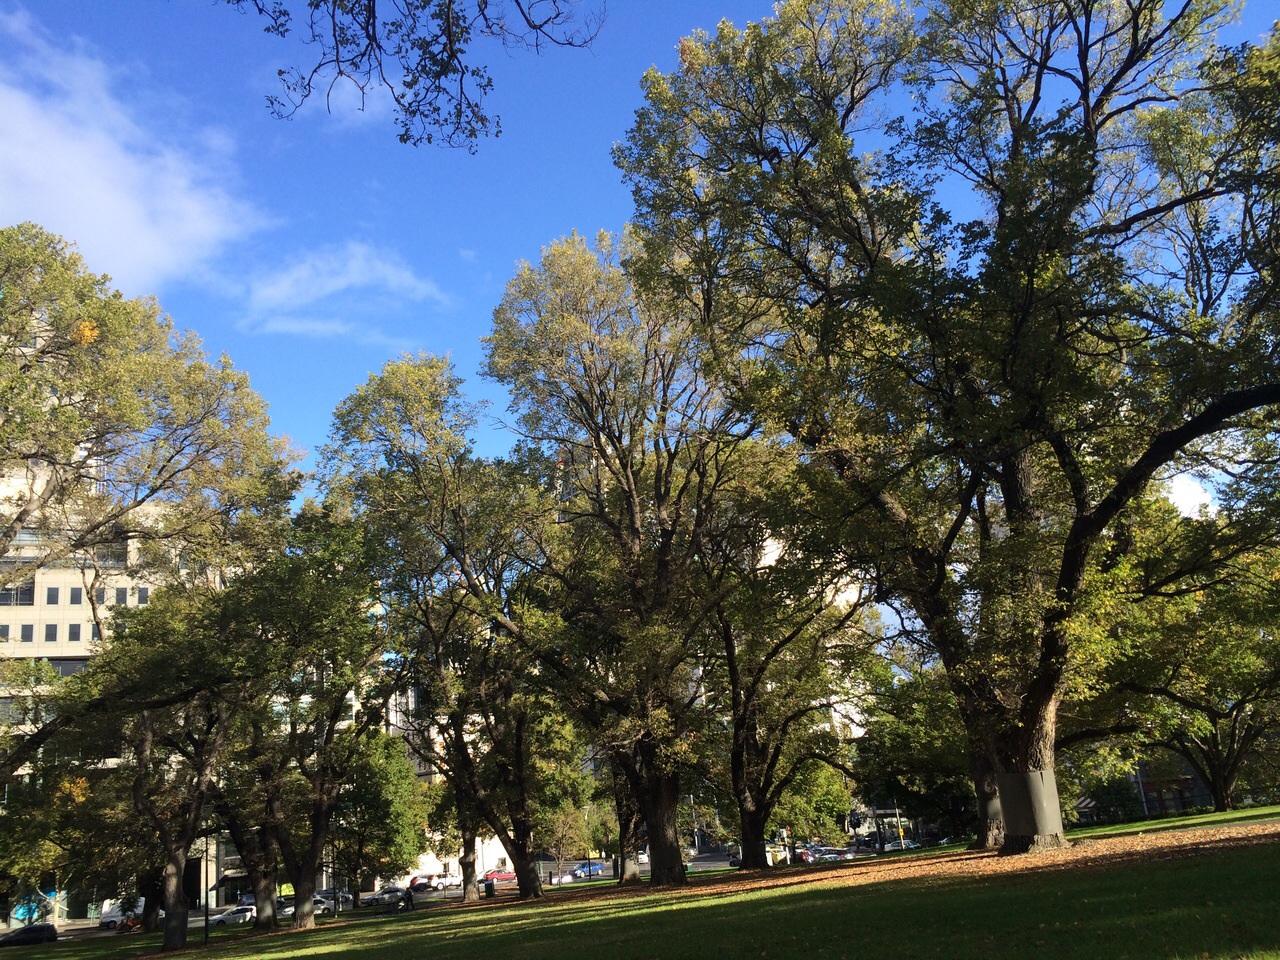 Flagstaff Garden Melbourne CBD